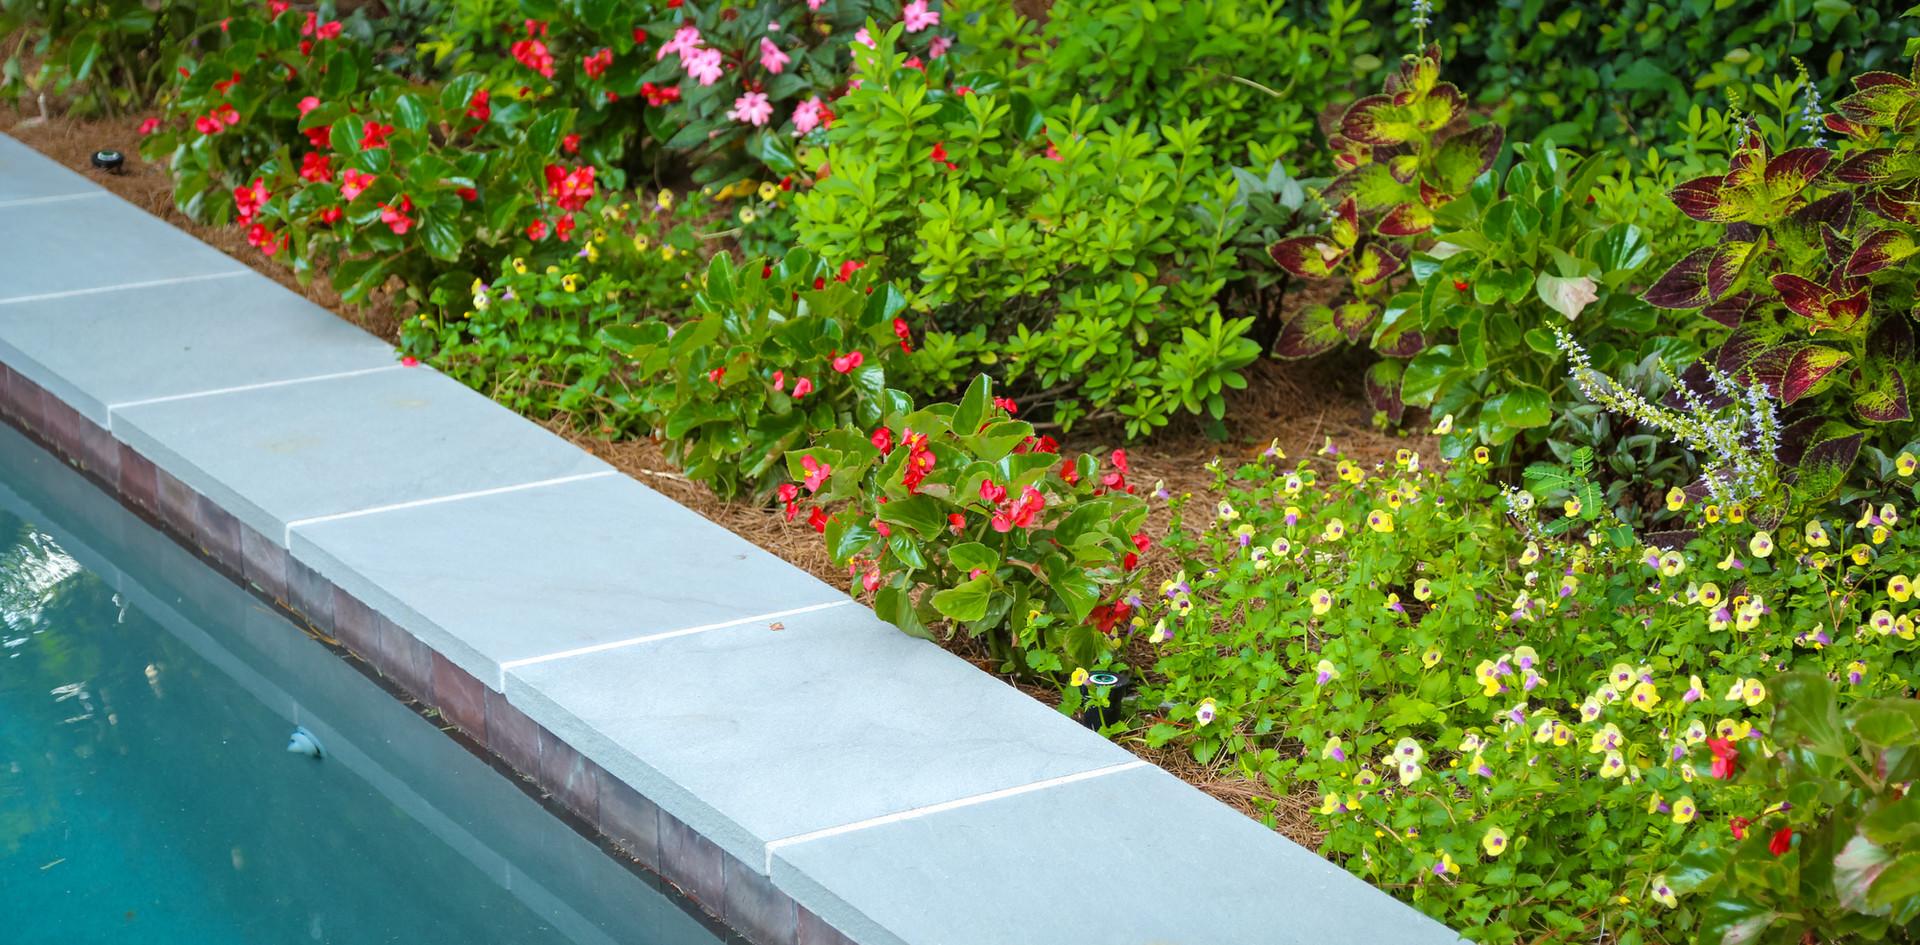 Poolside Garden Design with Seasonal Color